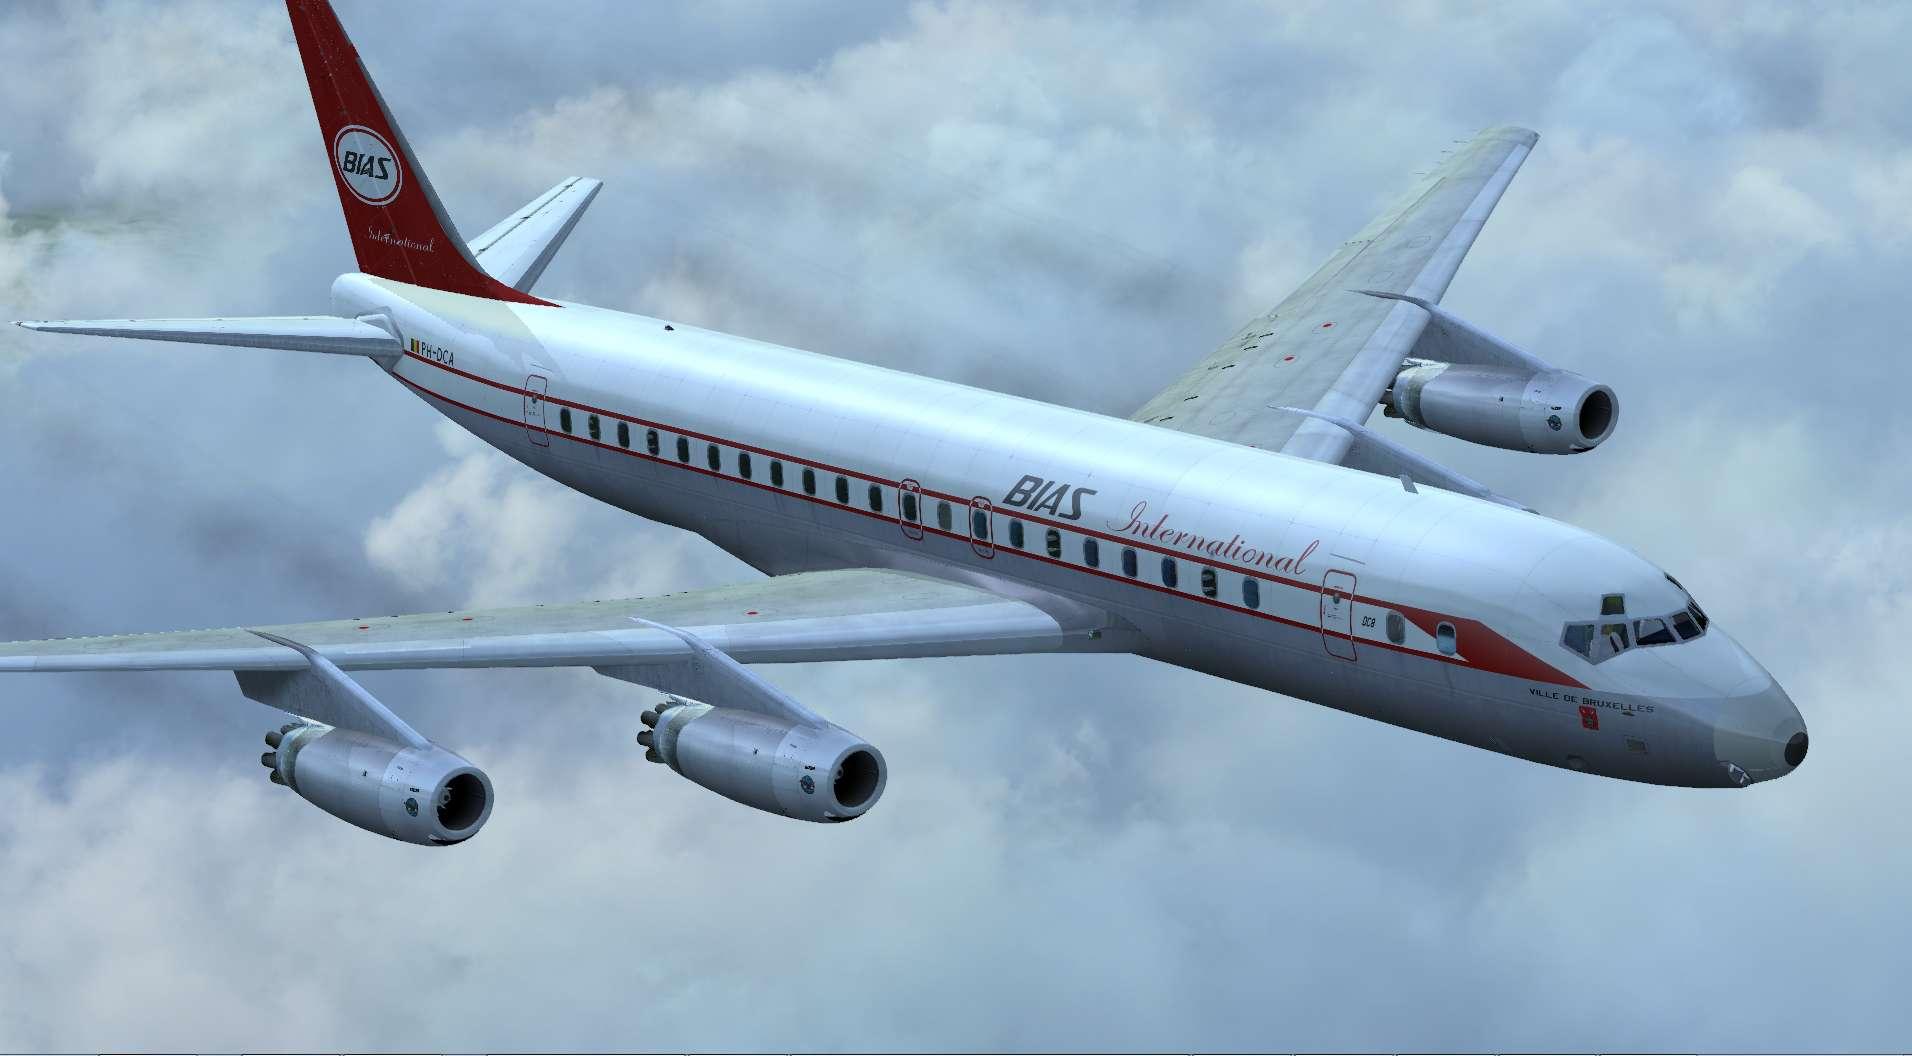 Just Flight - DC-8 Jetliner Series 10 to 40